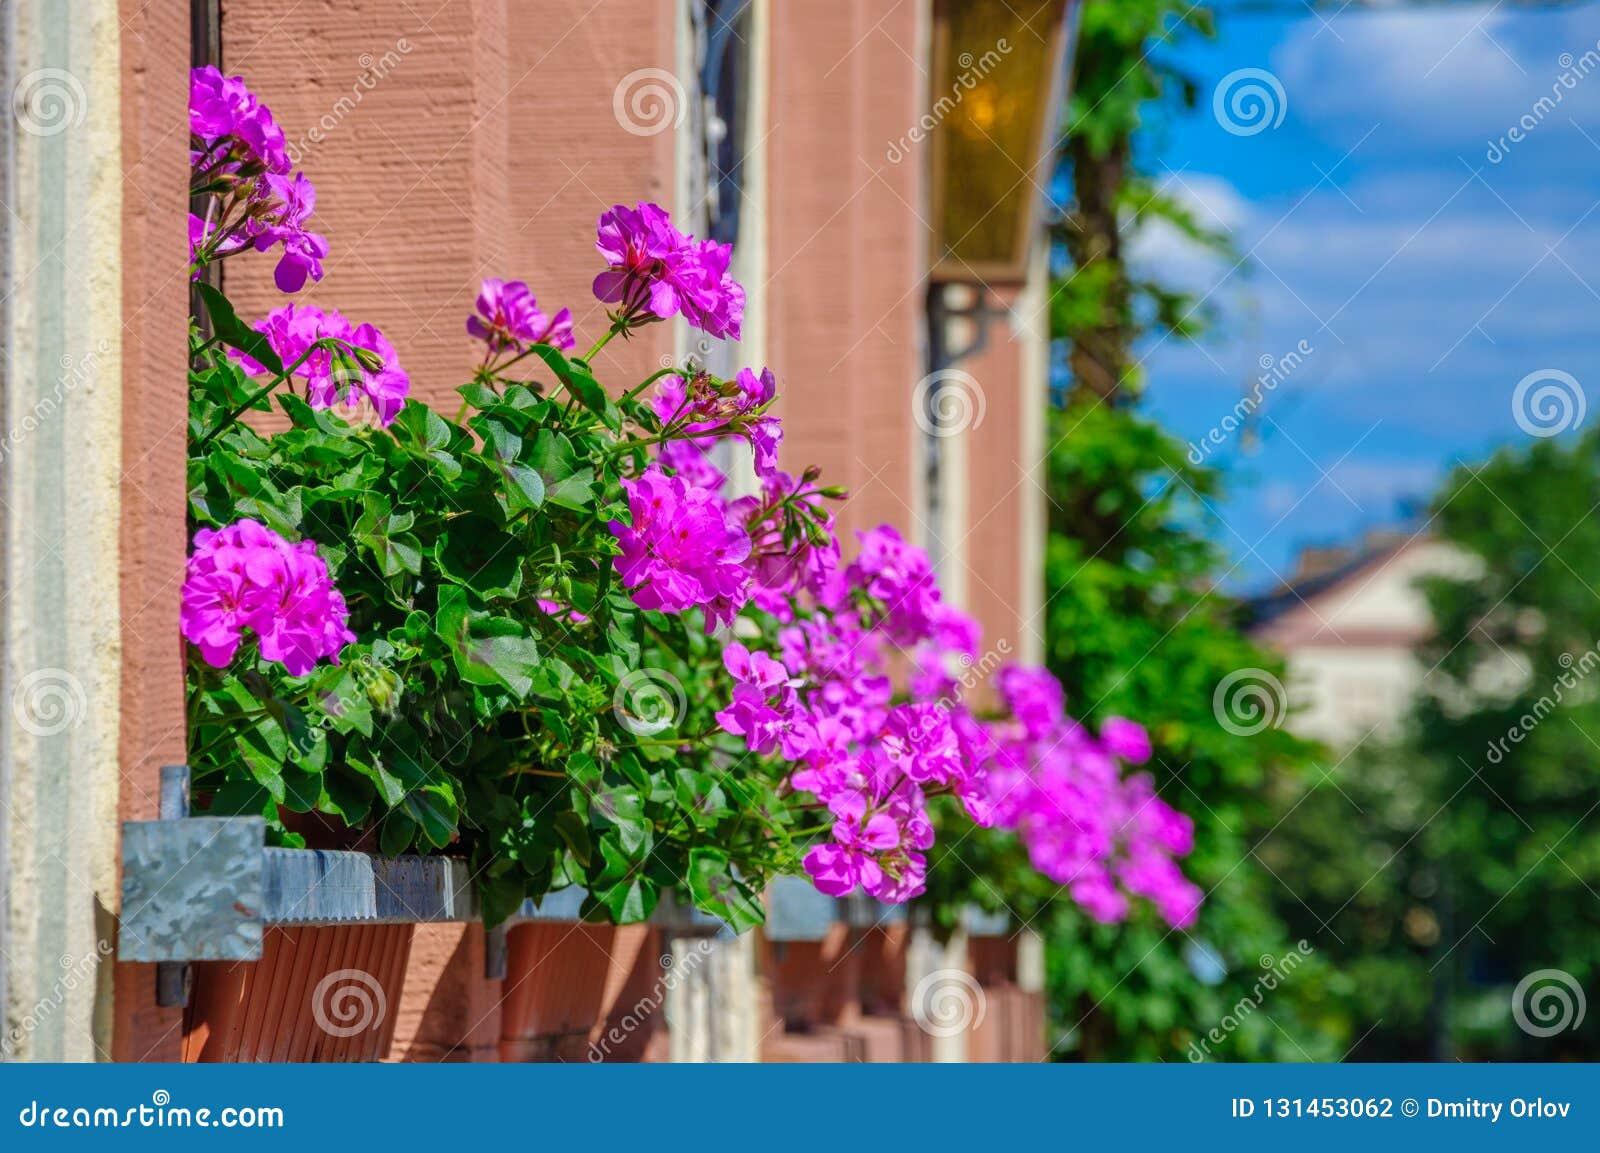 Purple flower Pelargonium, Geranium on the balcony